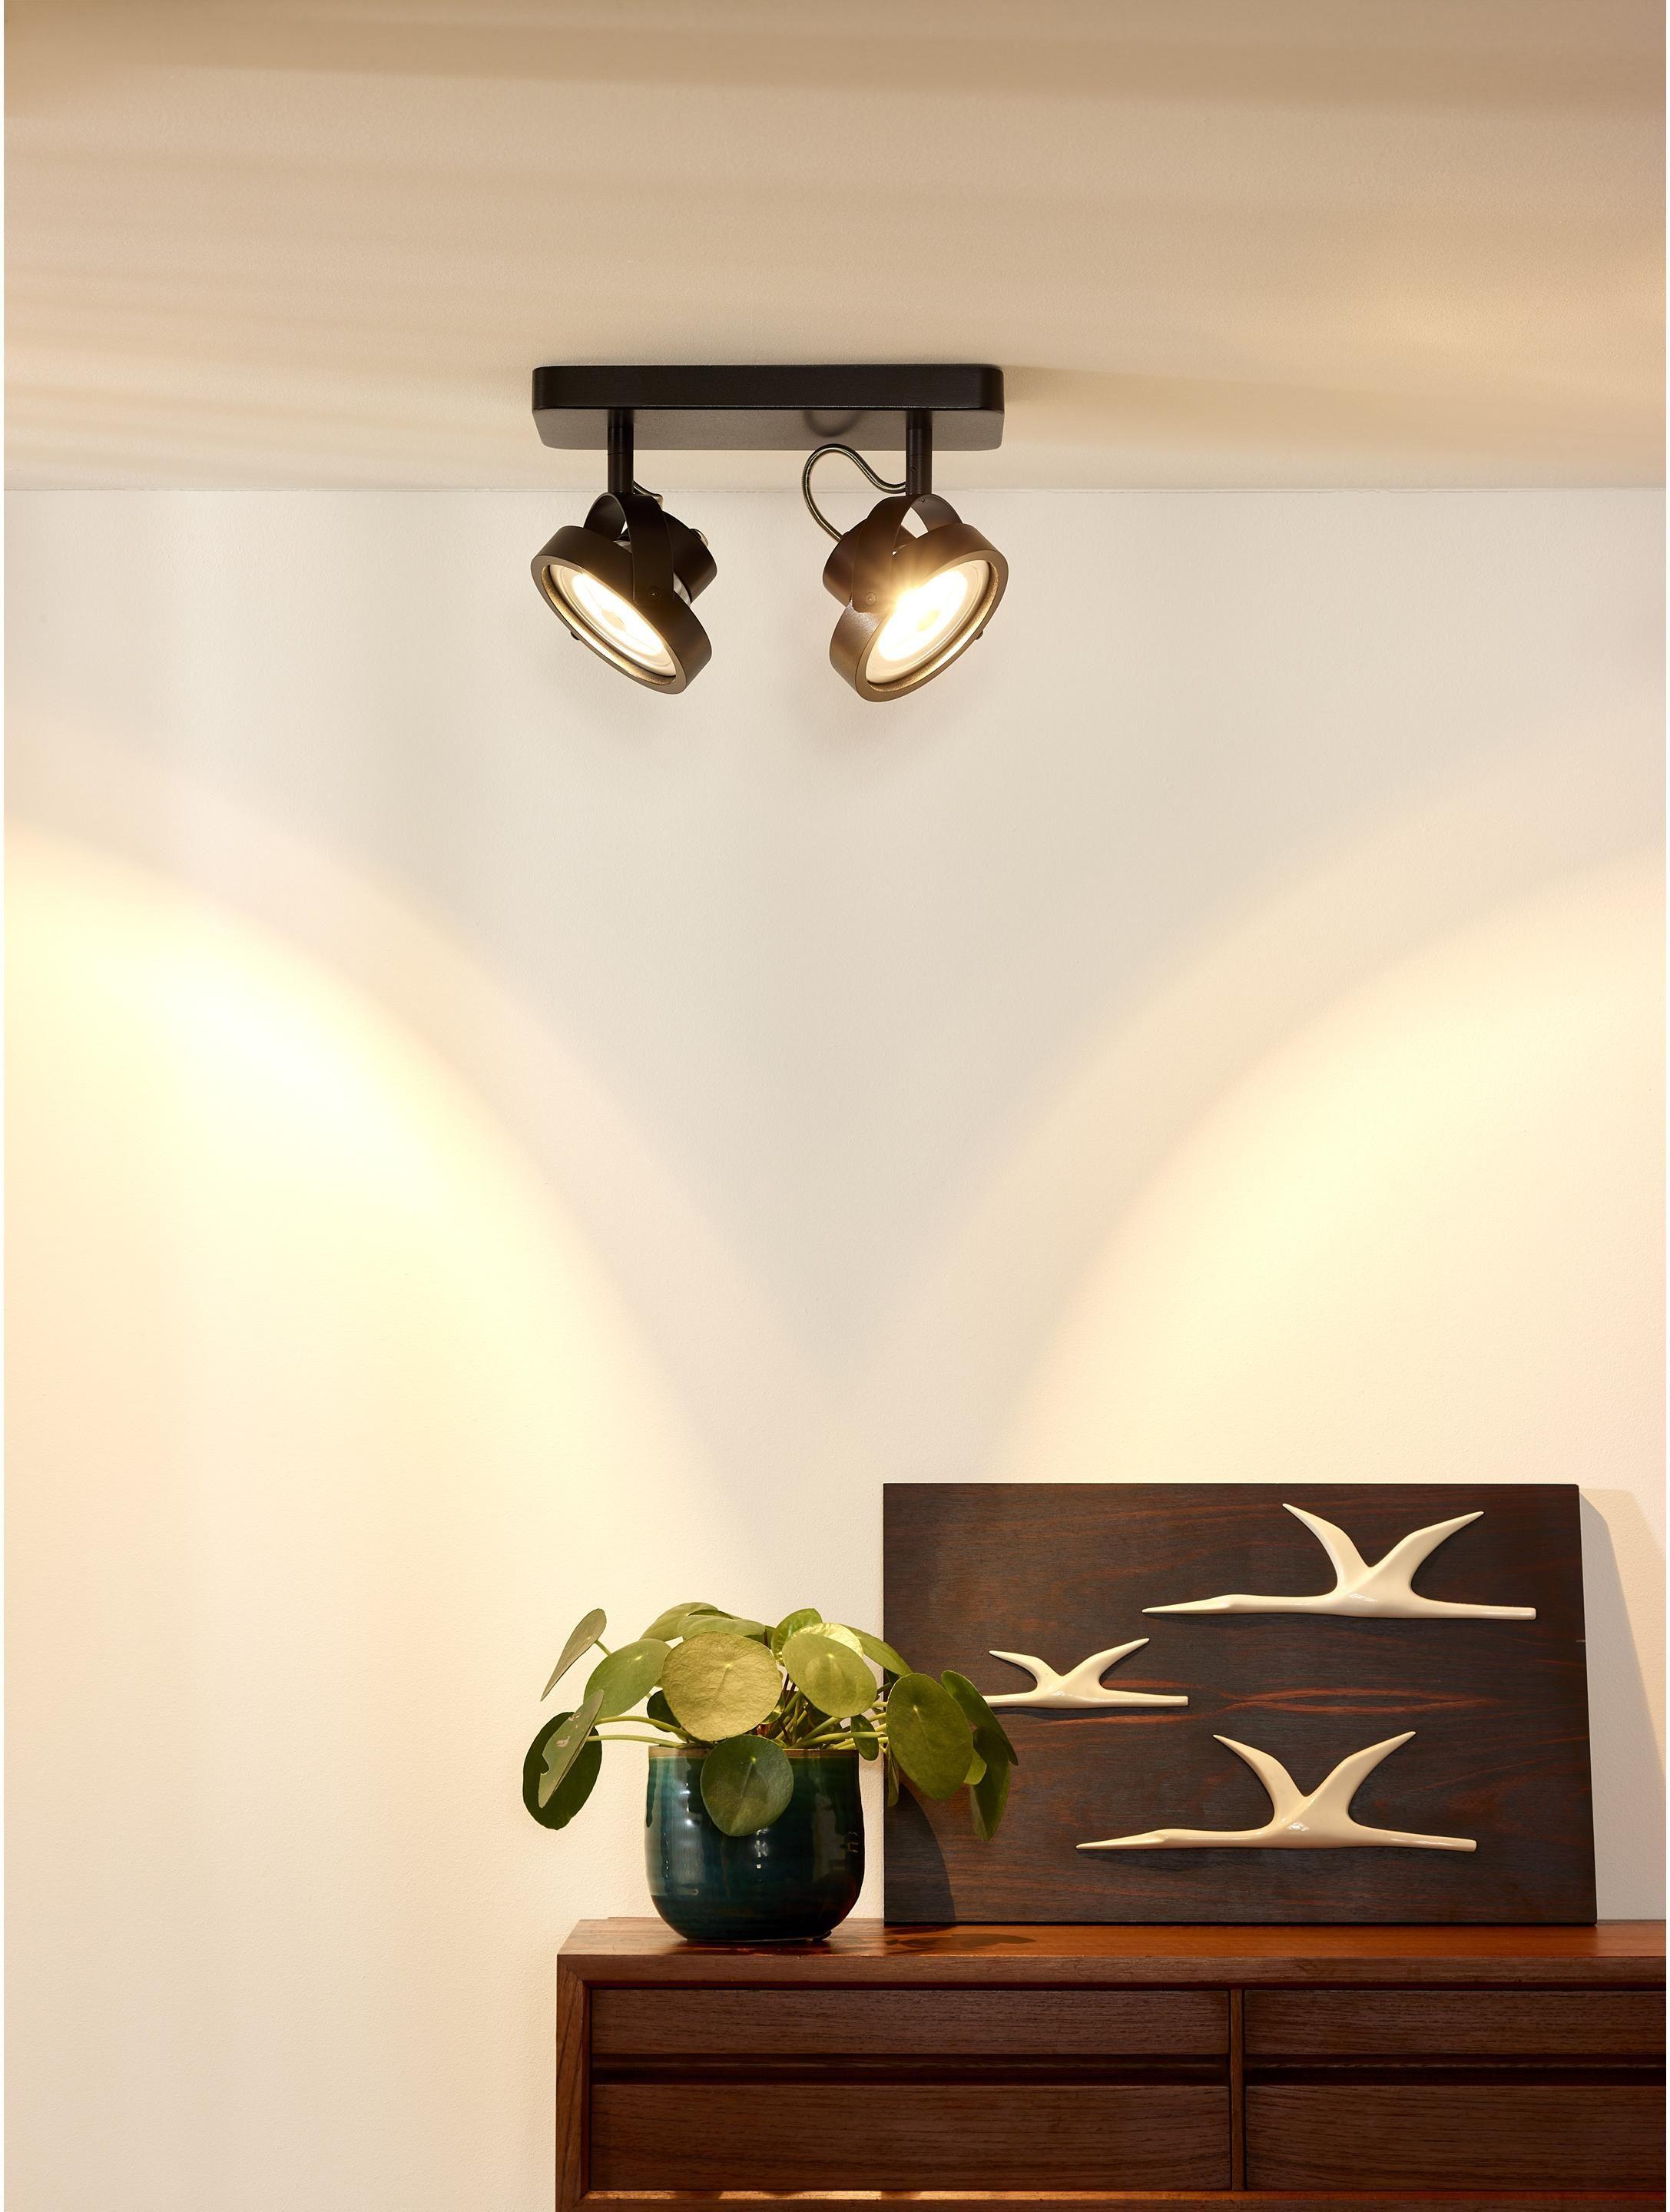 Rampe 2 Spots Gx53 Industriel Metal Noir Lucide Tala Applique Plafond Plafond Spot Plafond